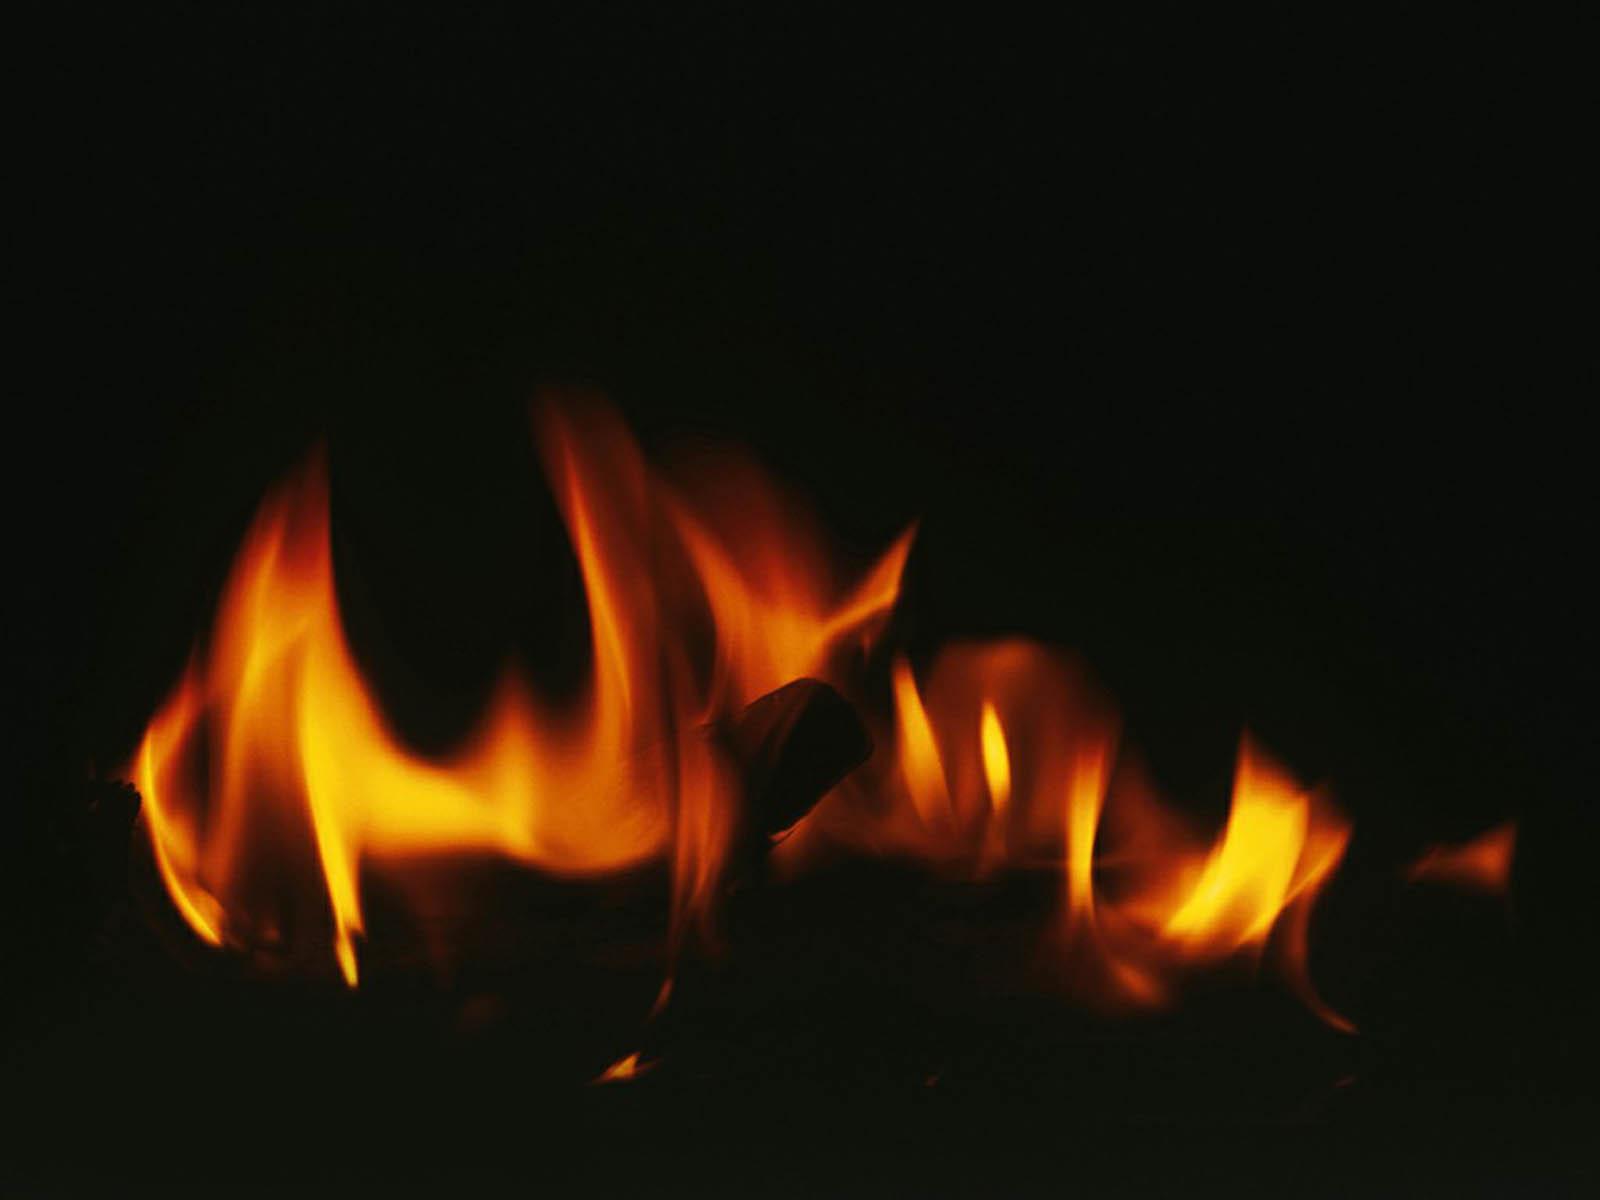 Fire Wallpaper Pc: HD Desktop Background